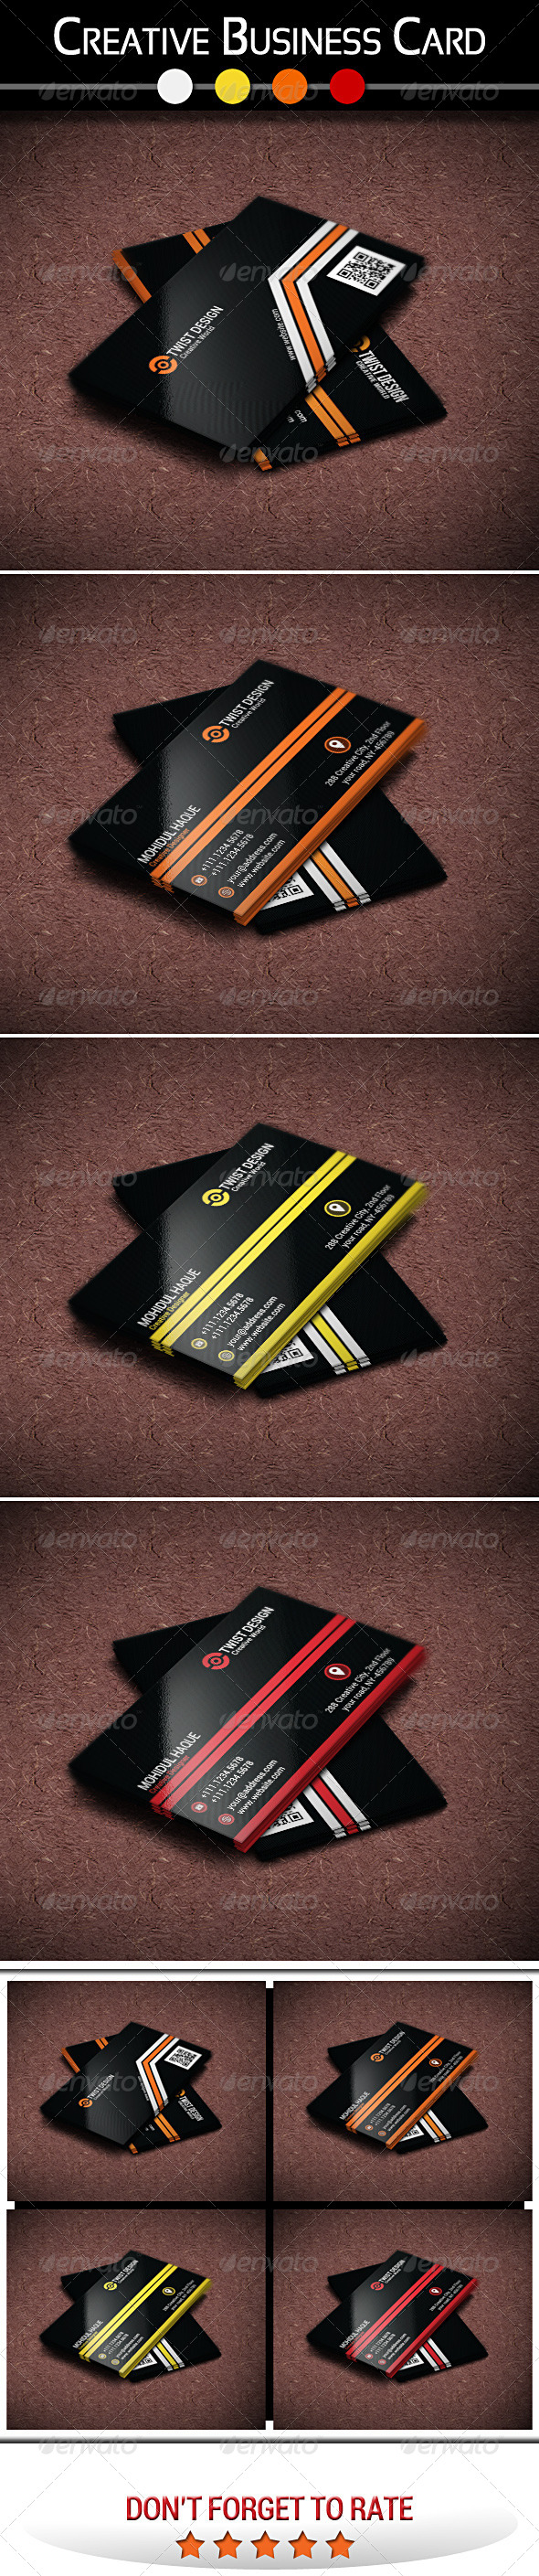 Creative Business Card V-2 - Creative Business Cards